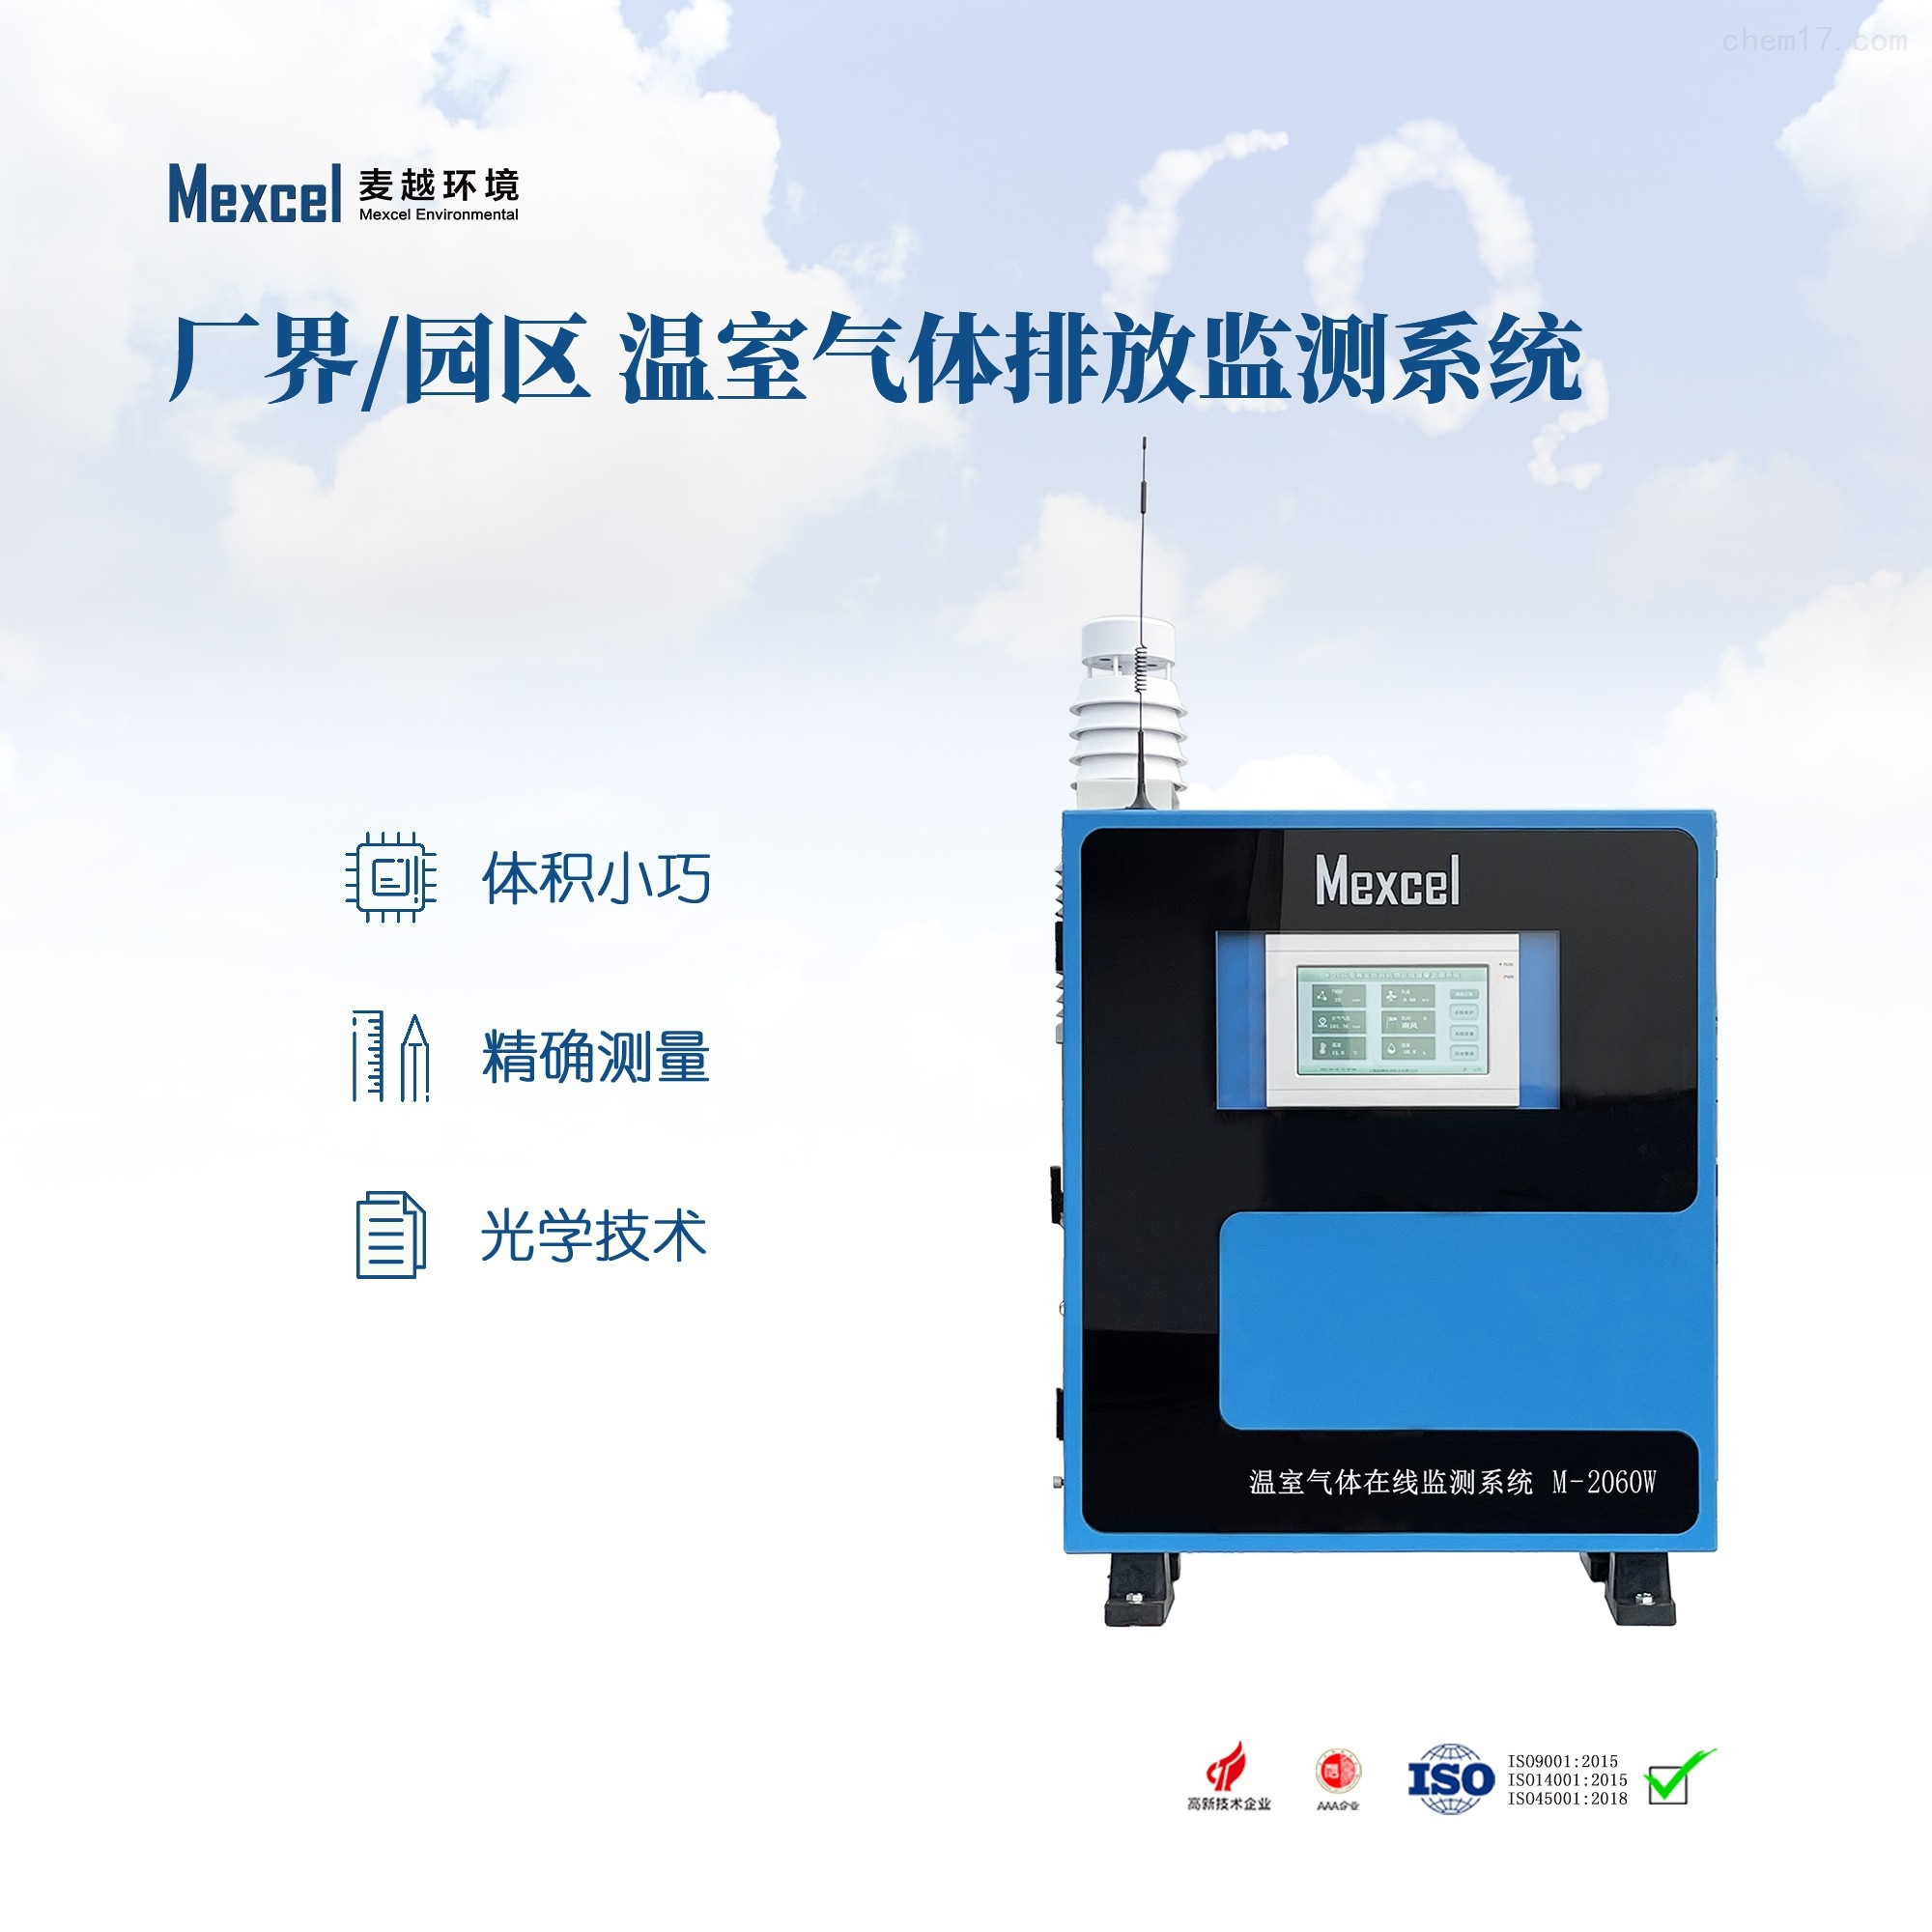 M2060W.jpg